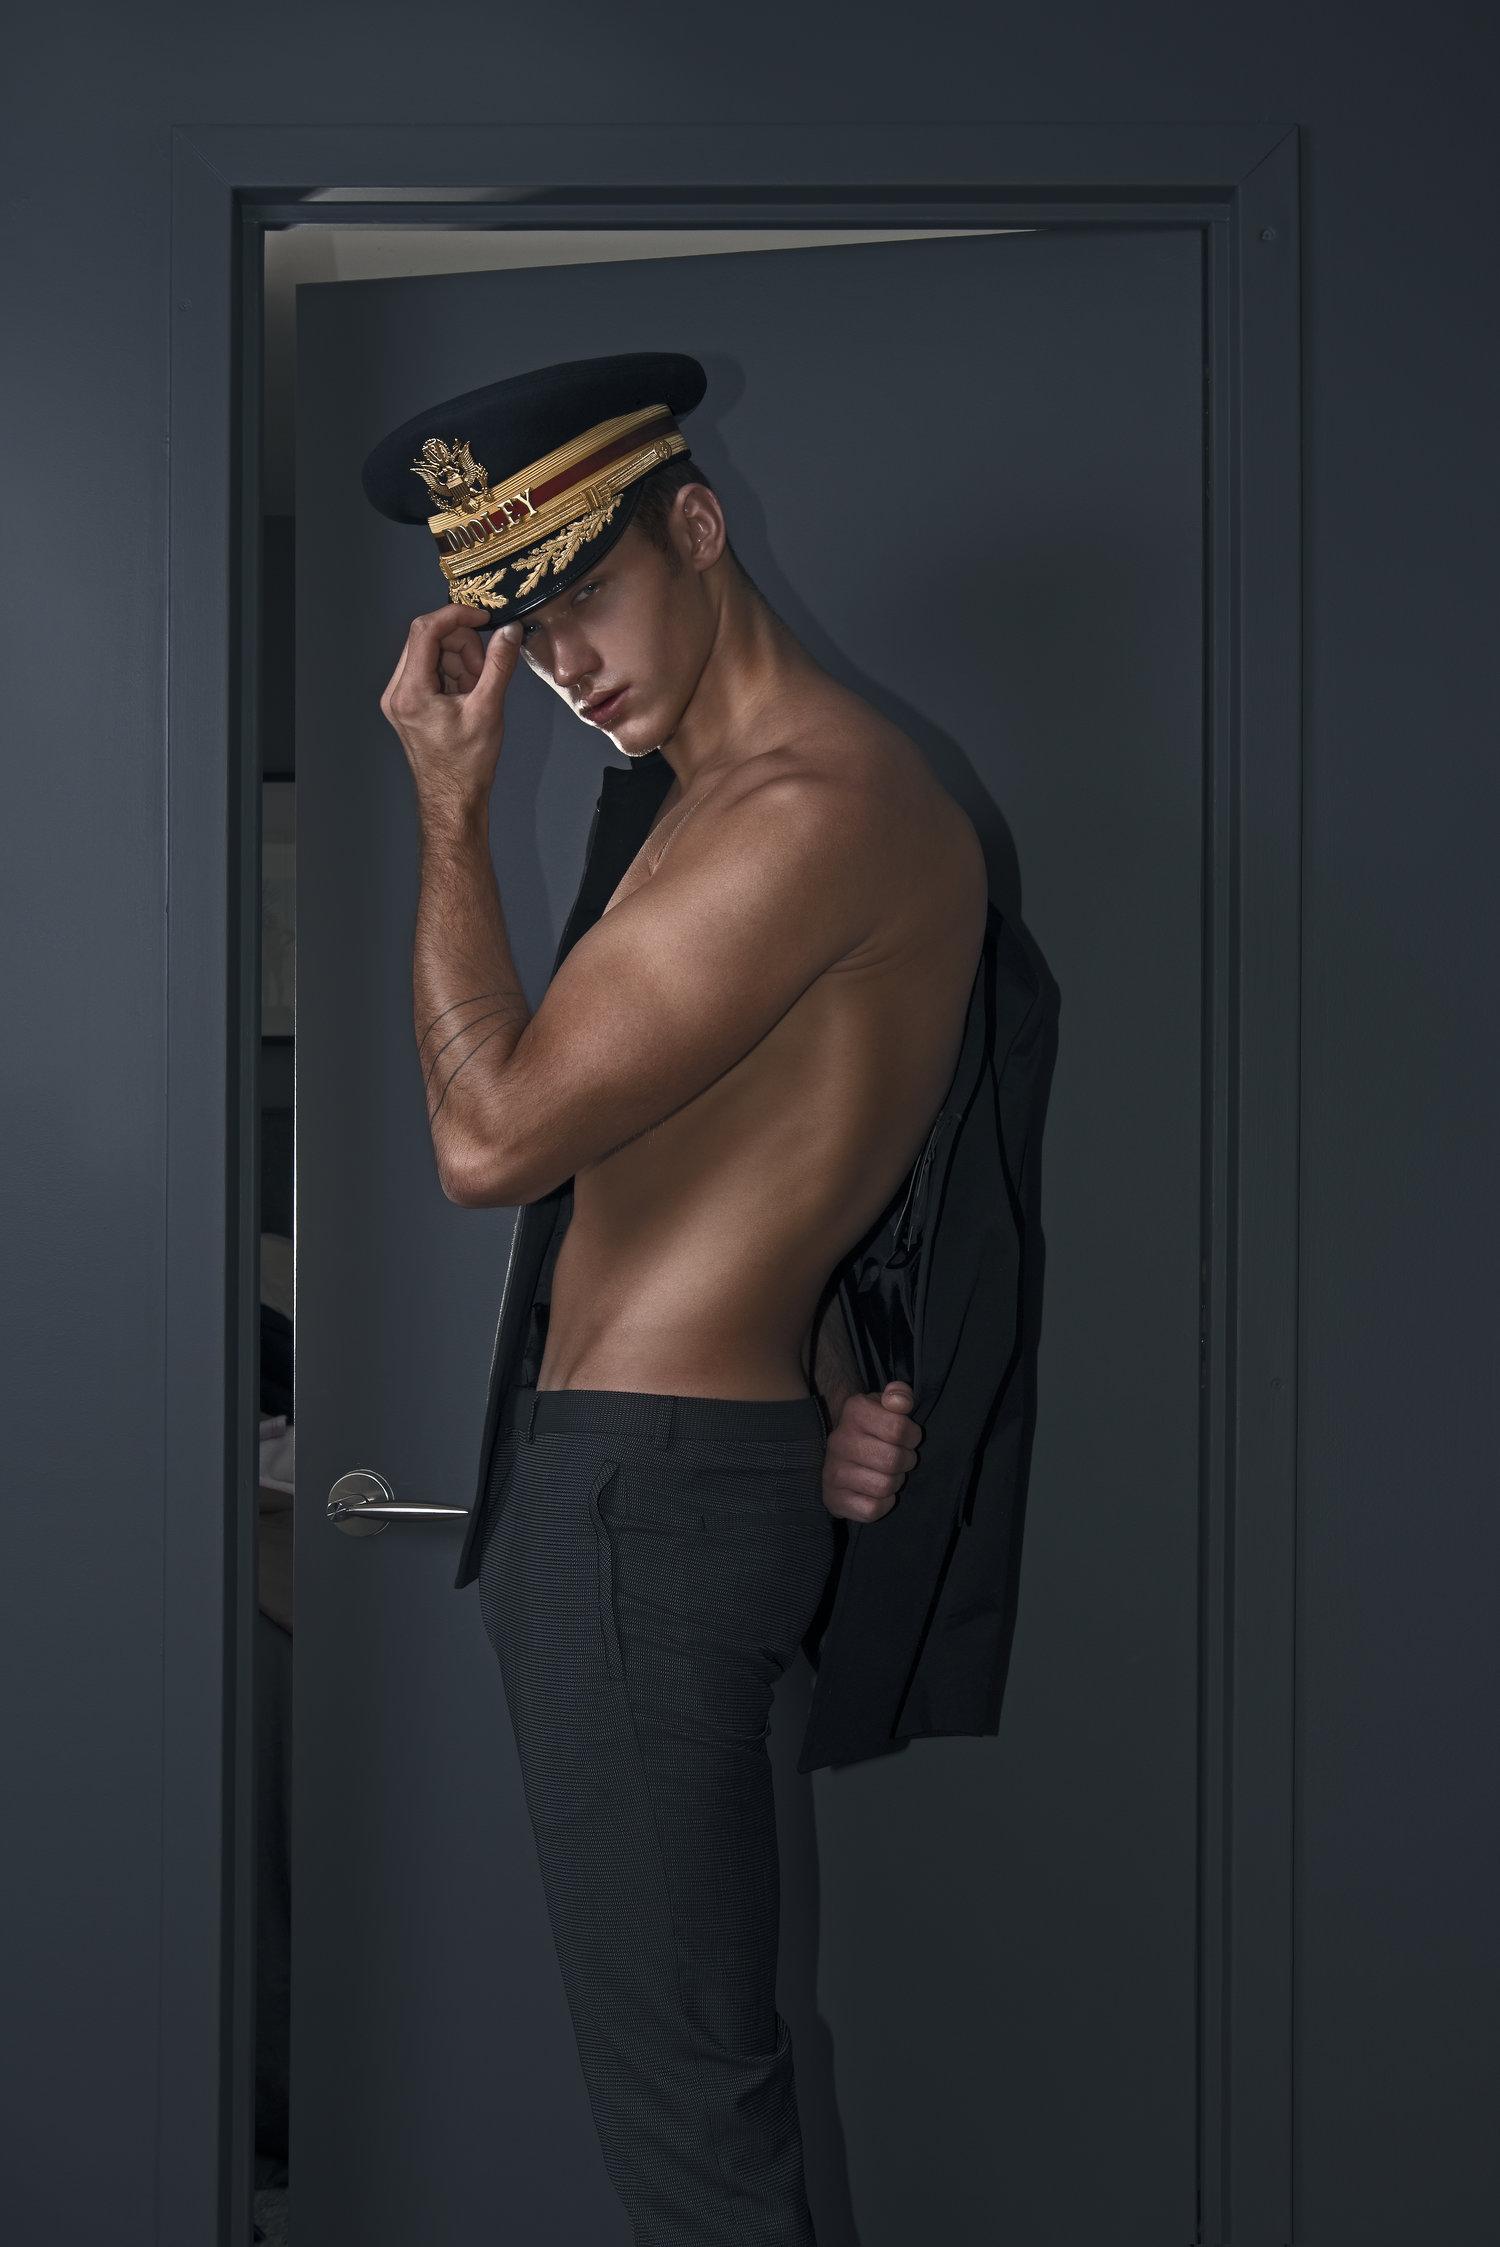 Adon Exclusive: Model Jacob Dooley By Viktor Klimenko